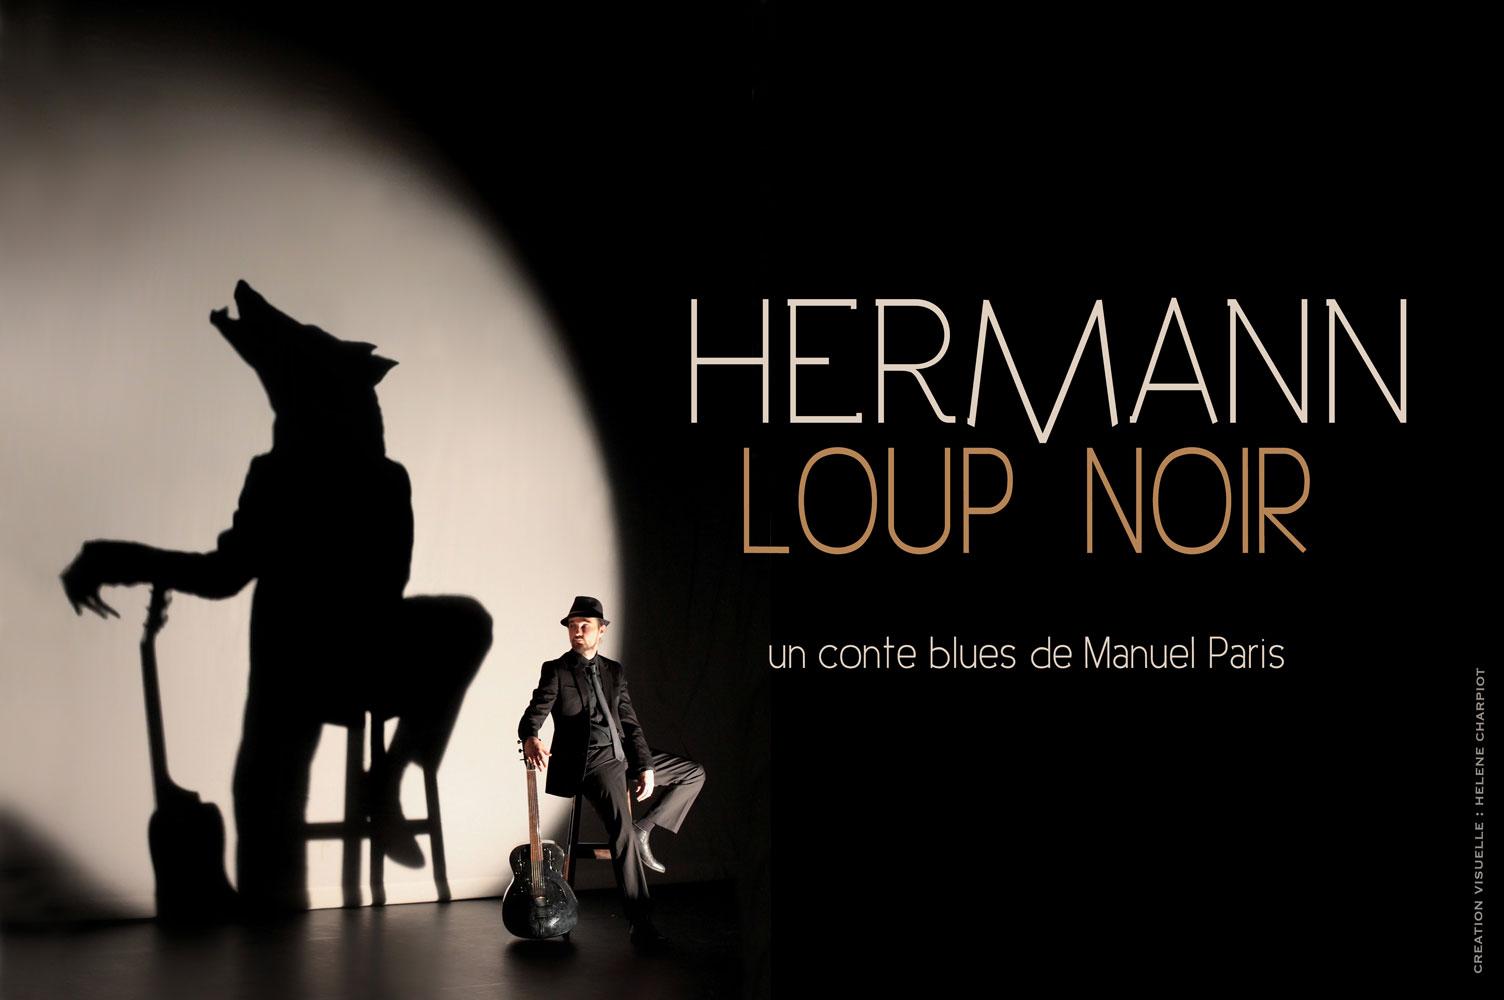 Hermann loup noir